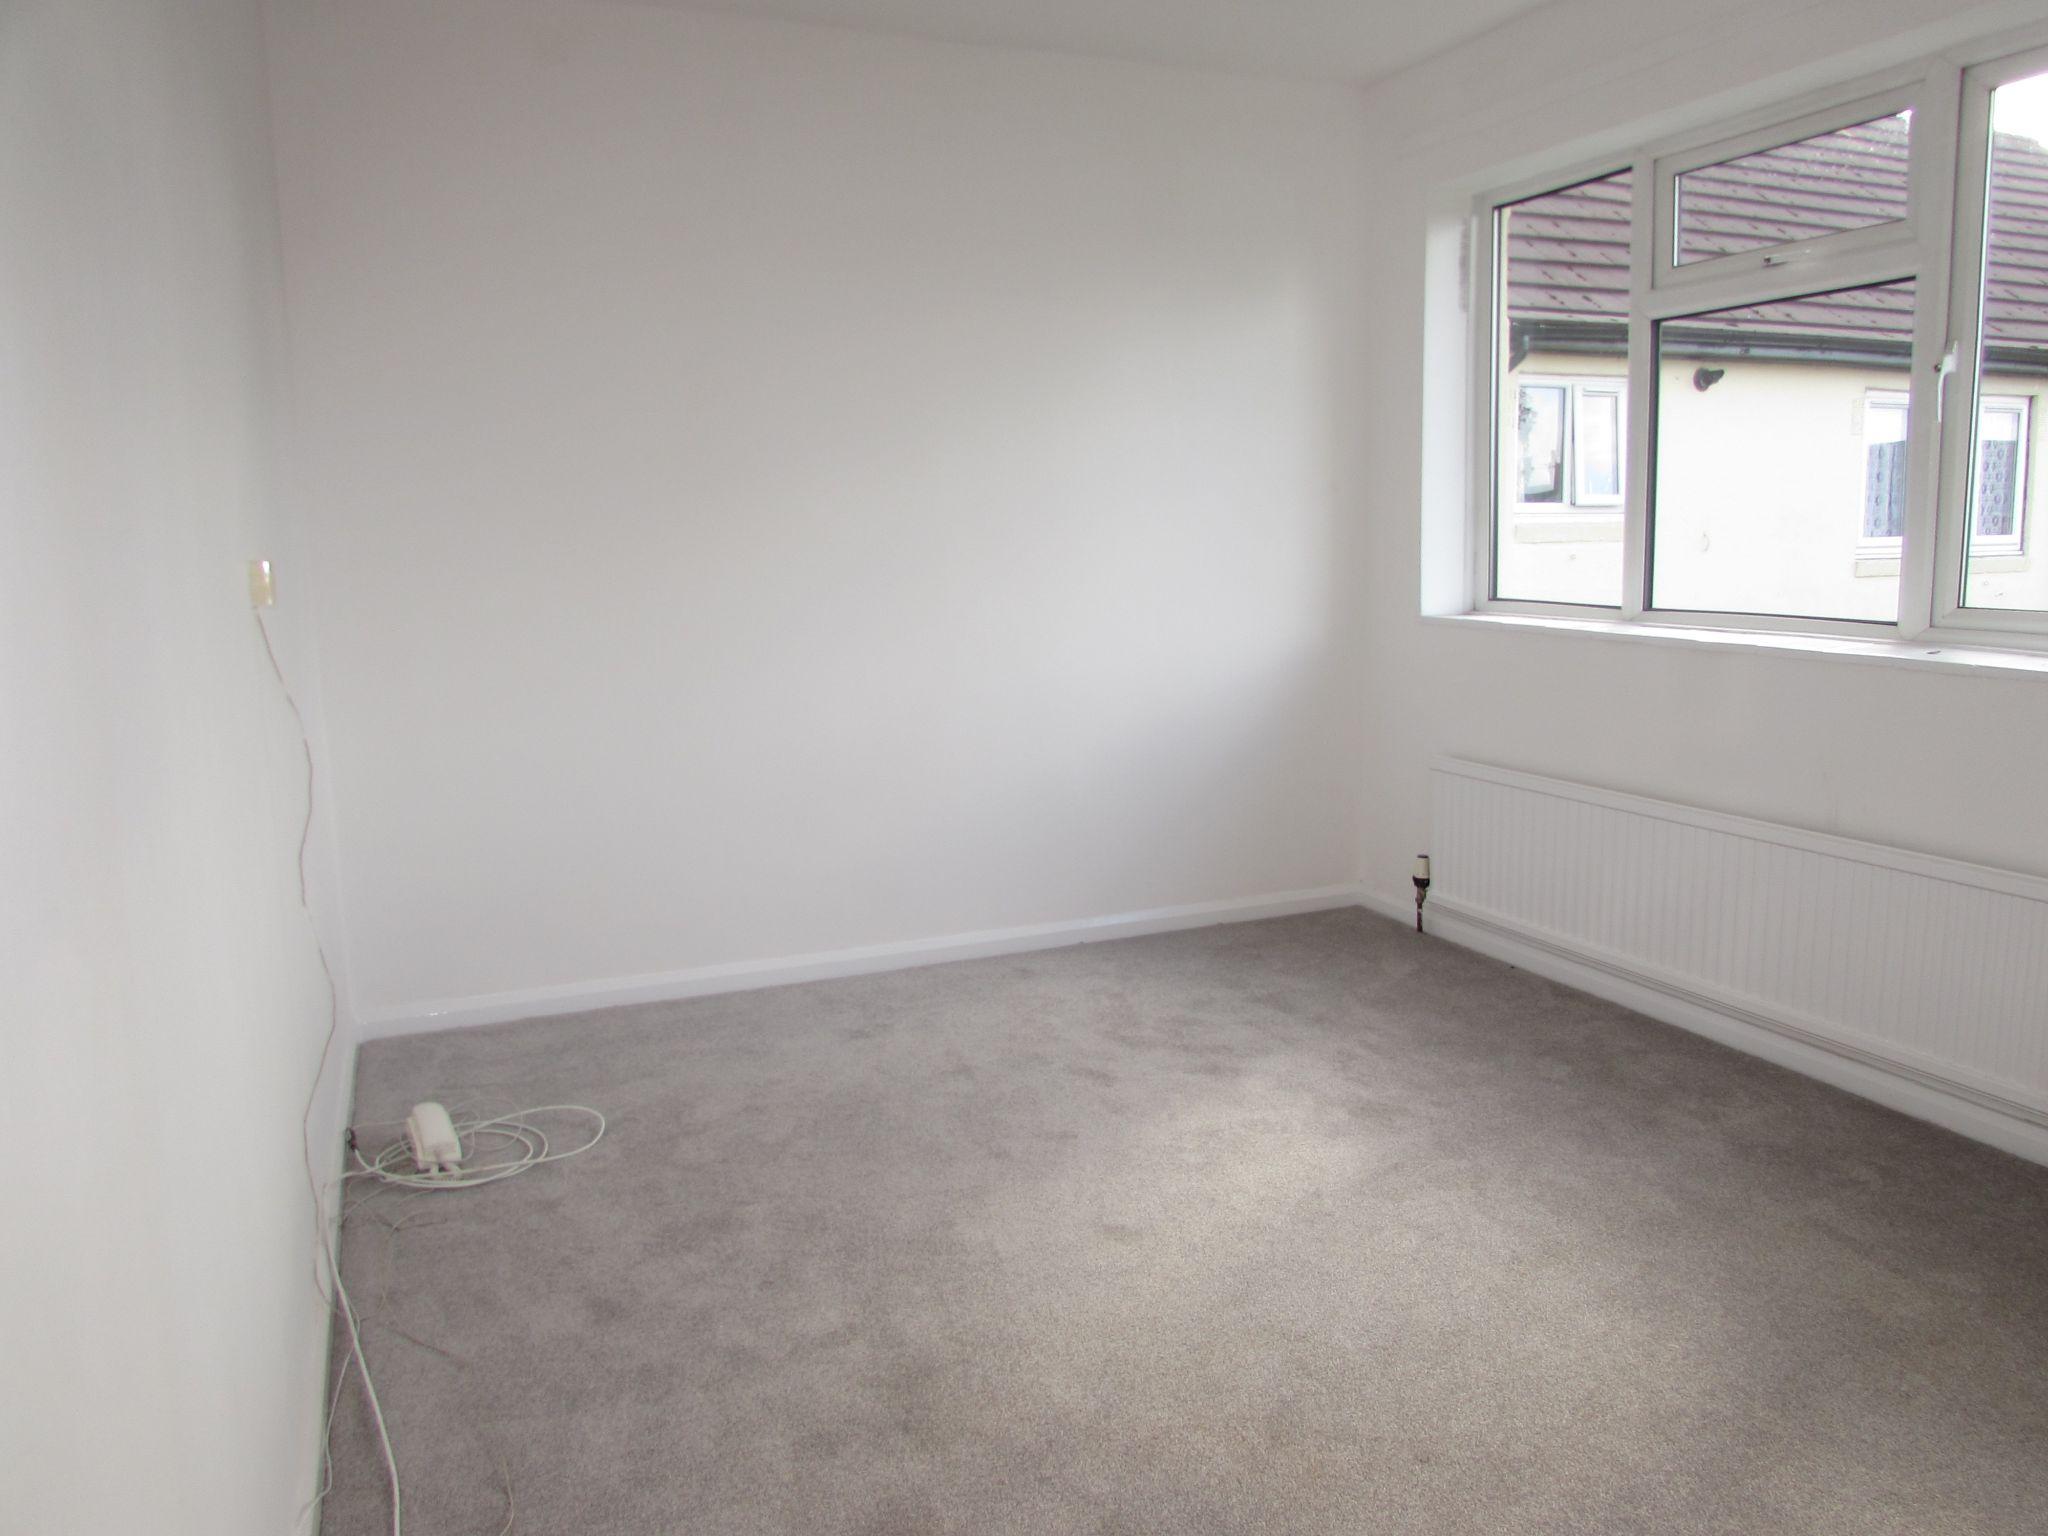 4 Bedroom Semi-detached House For Sale - BEDROOM 3